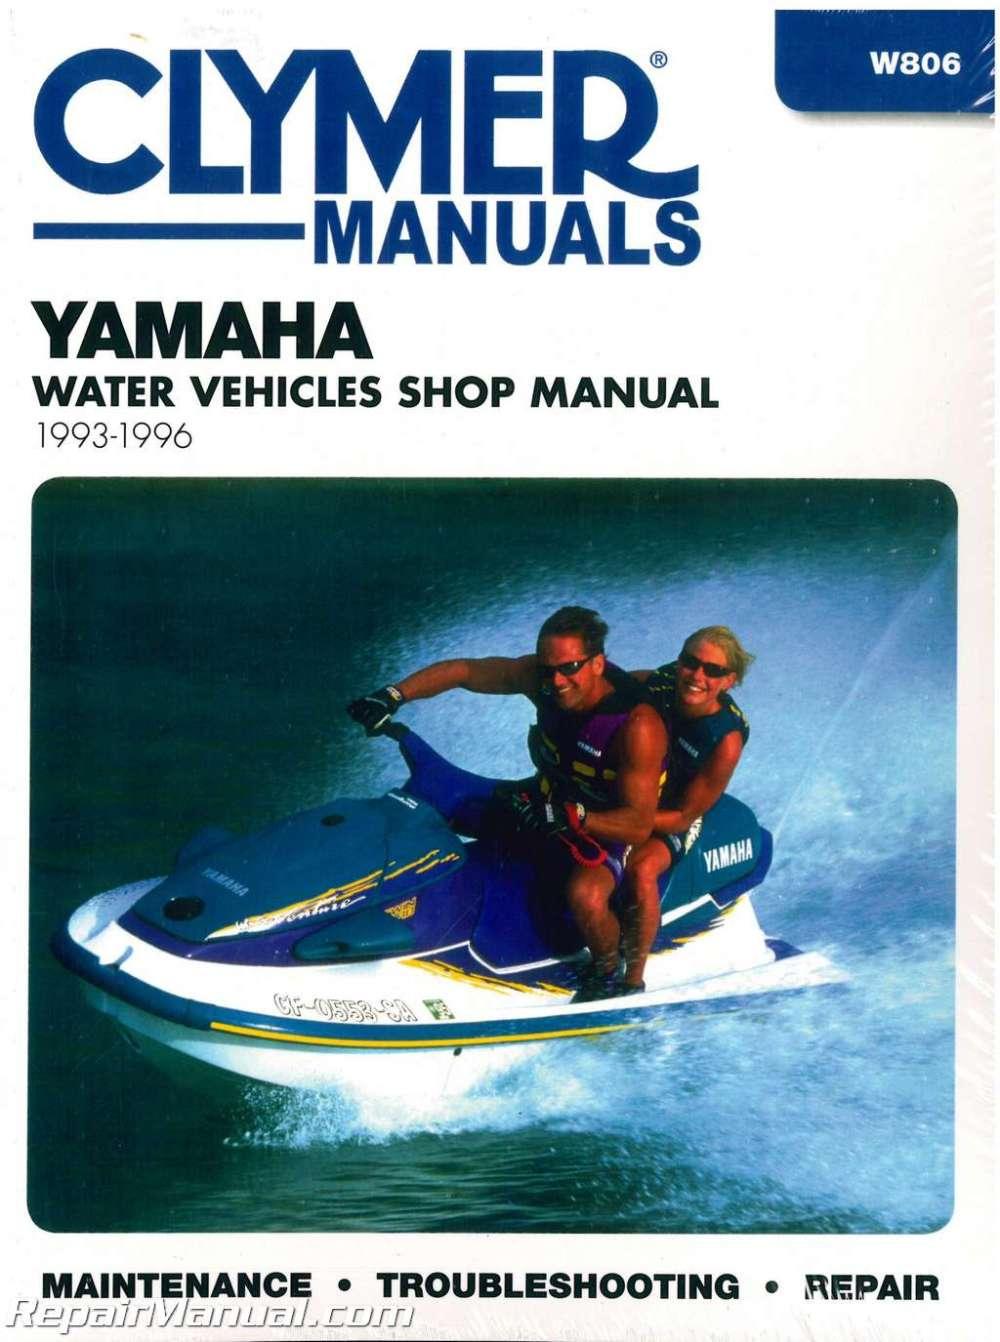 medium resolution of 1993 1996 yamaha waverunner clymer personal watercraft service manual